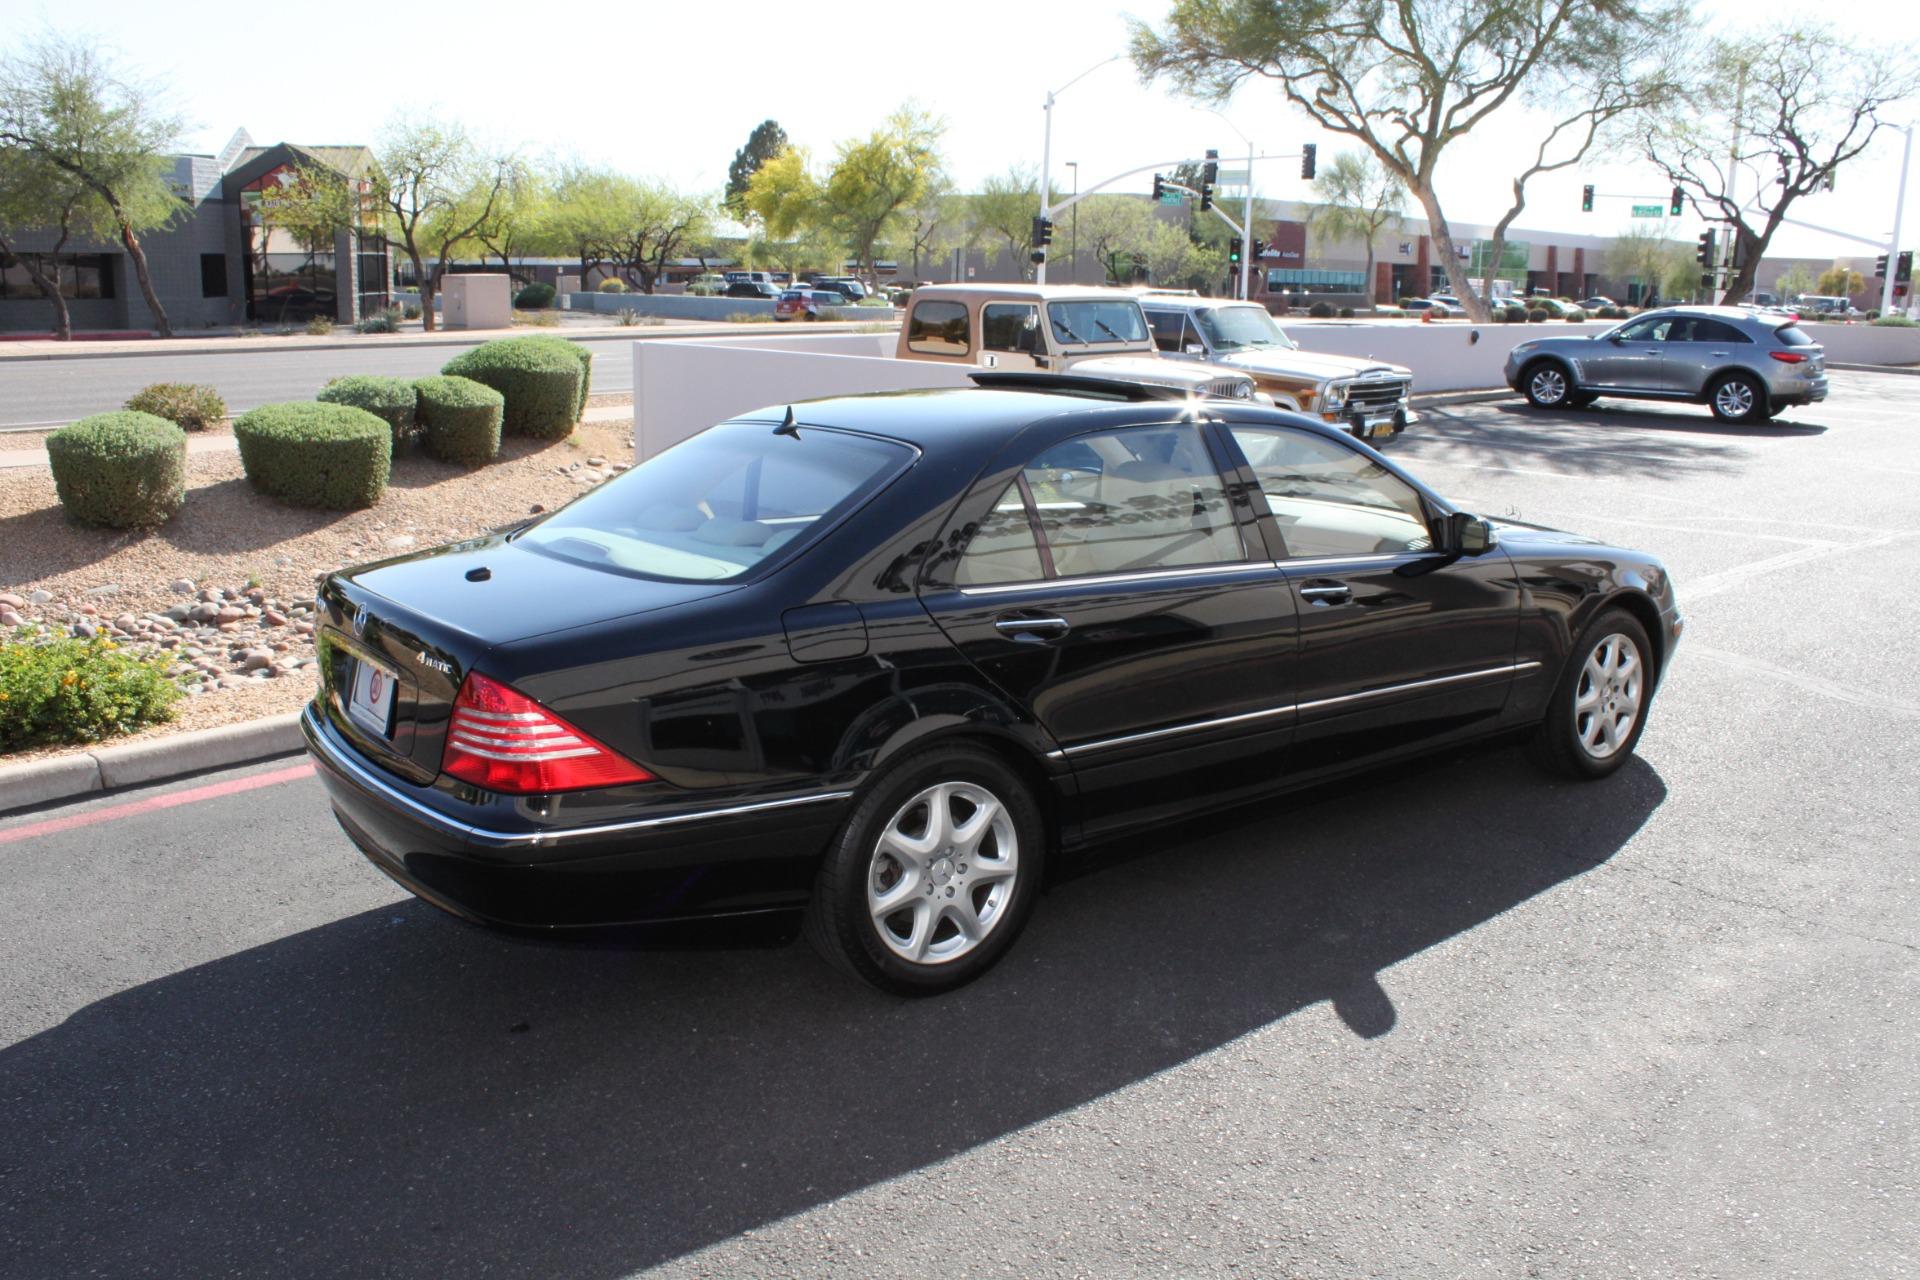 Used-2006-Mercedes-Benz-S-Class-43L-Mini